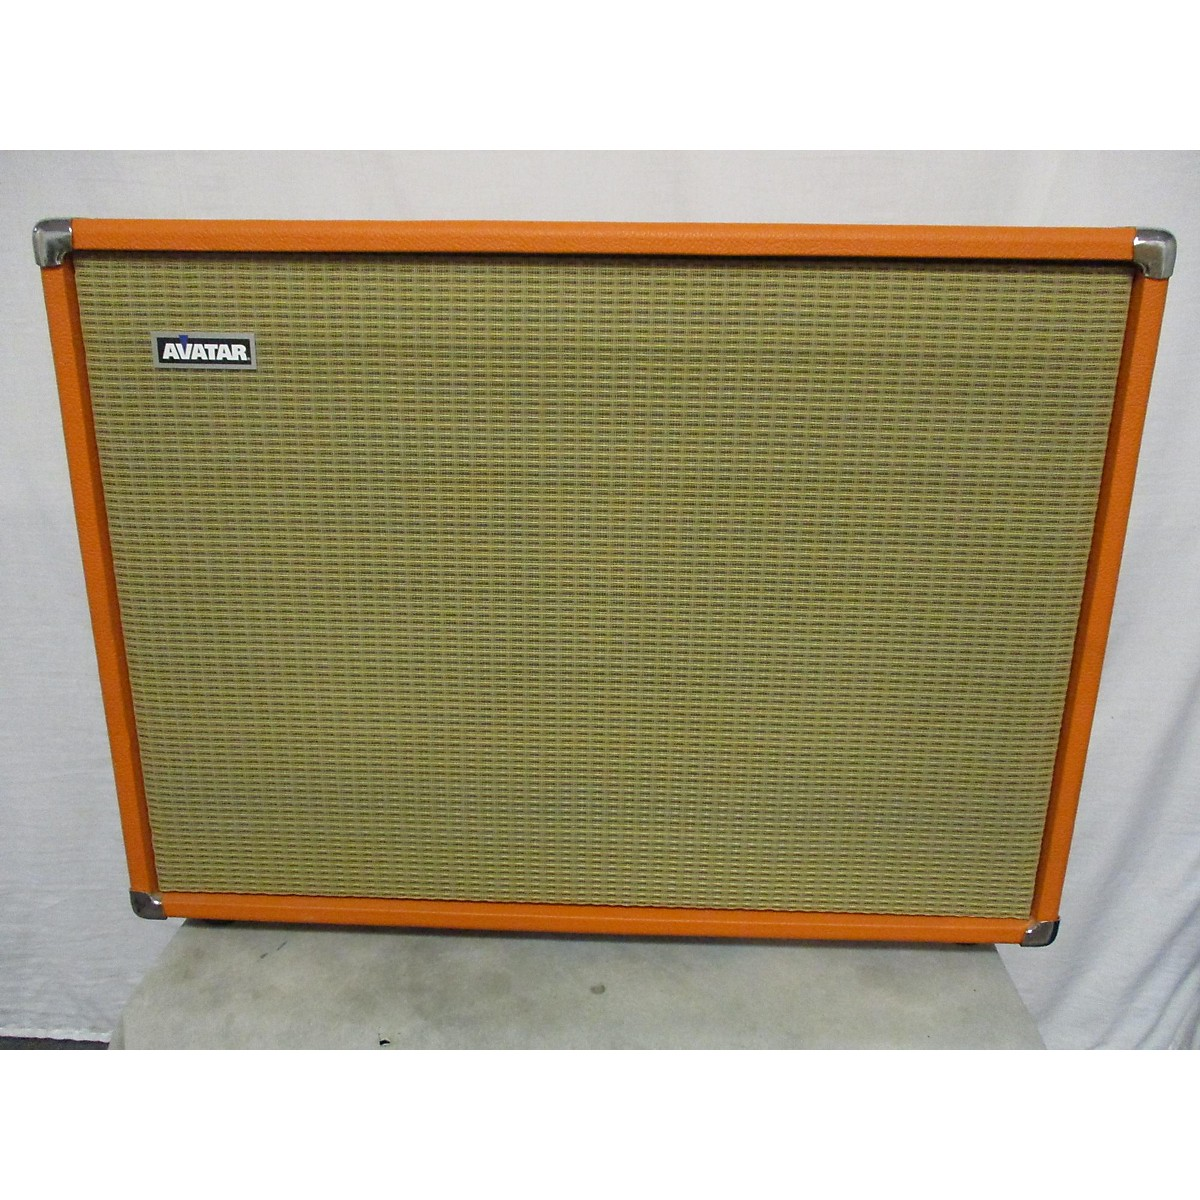 Avatar 2x12 Orange Cabinet Guitar Cabinet